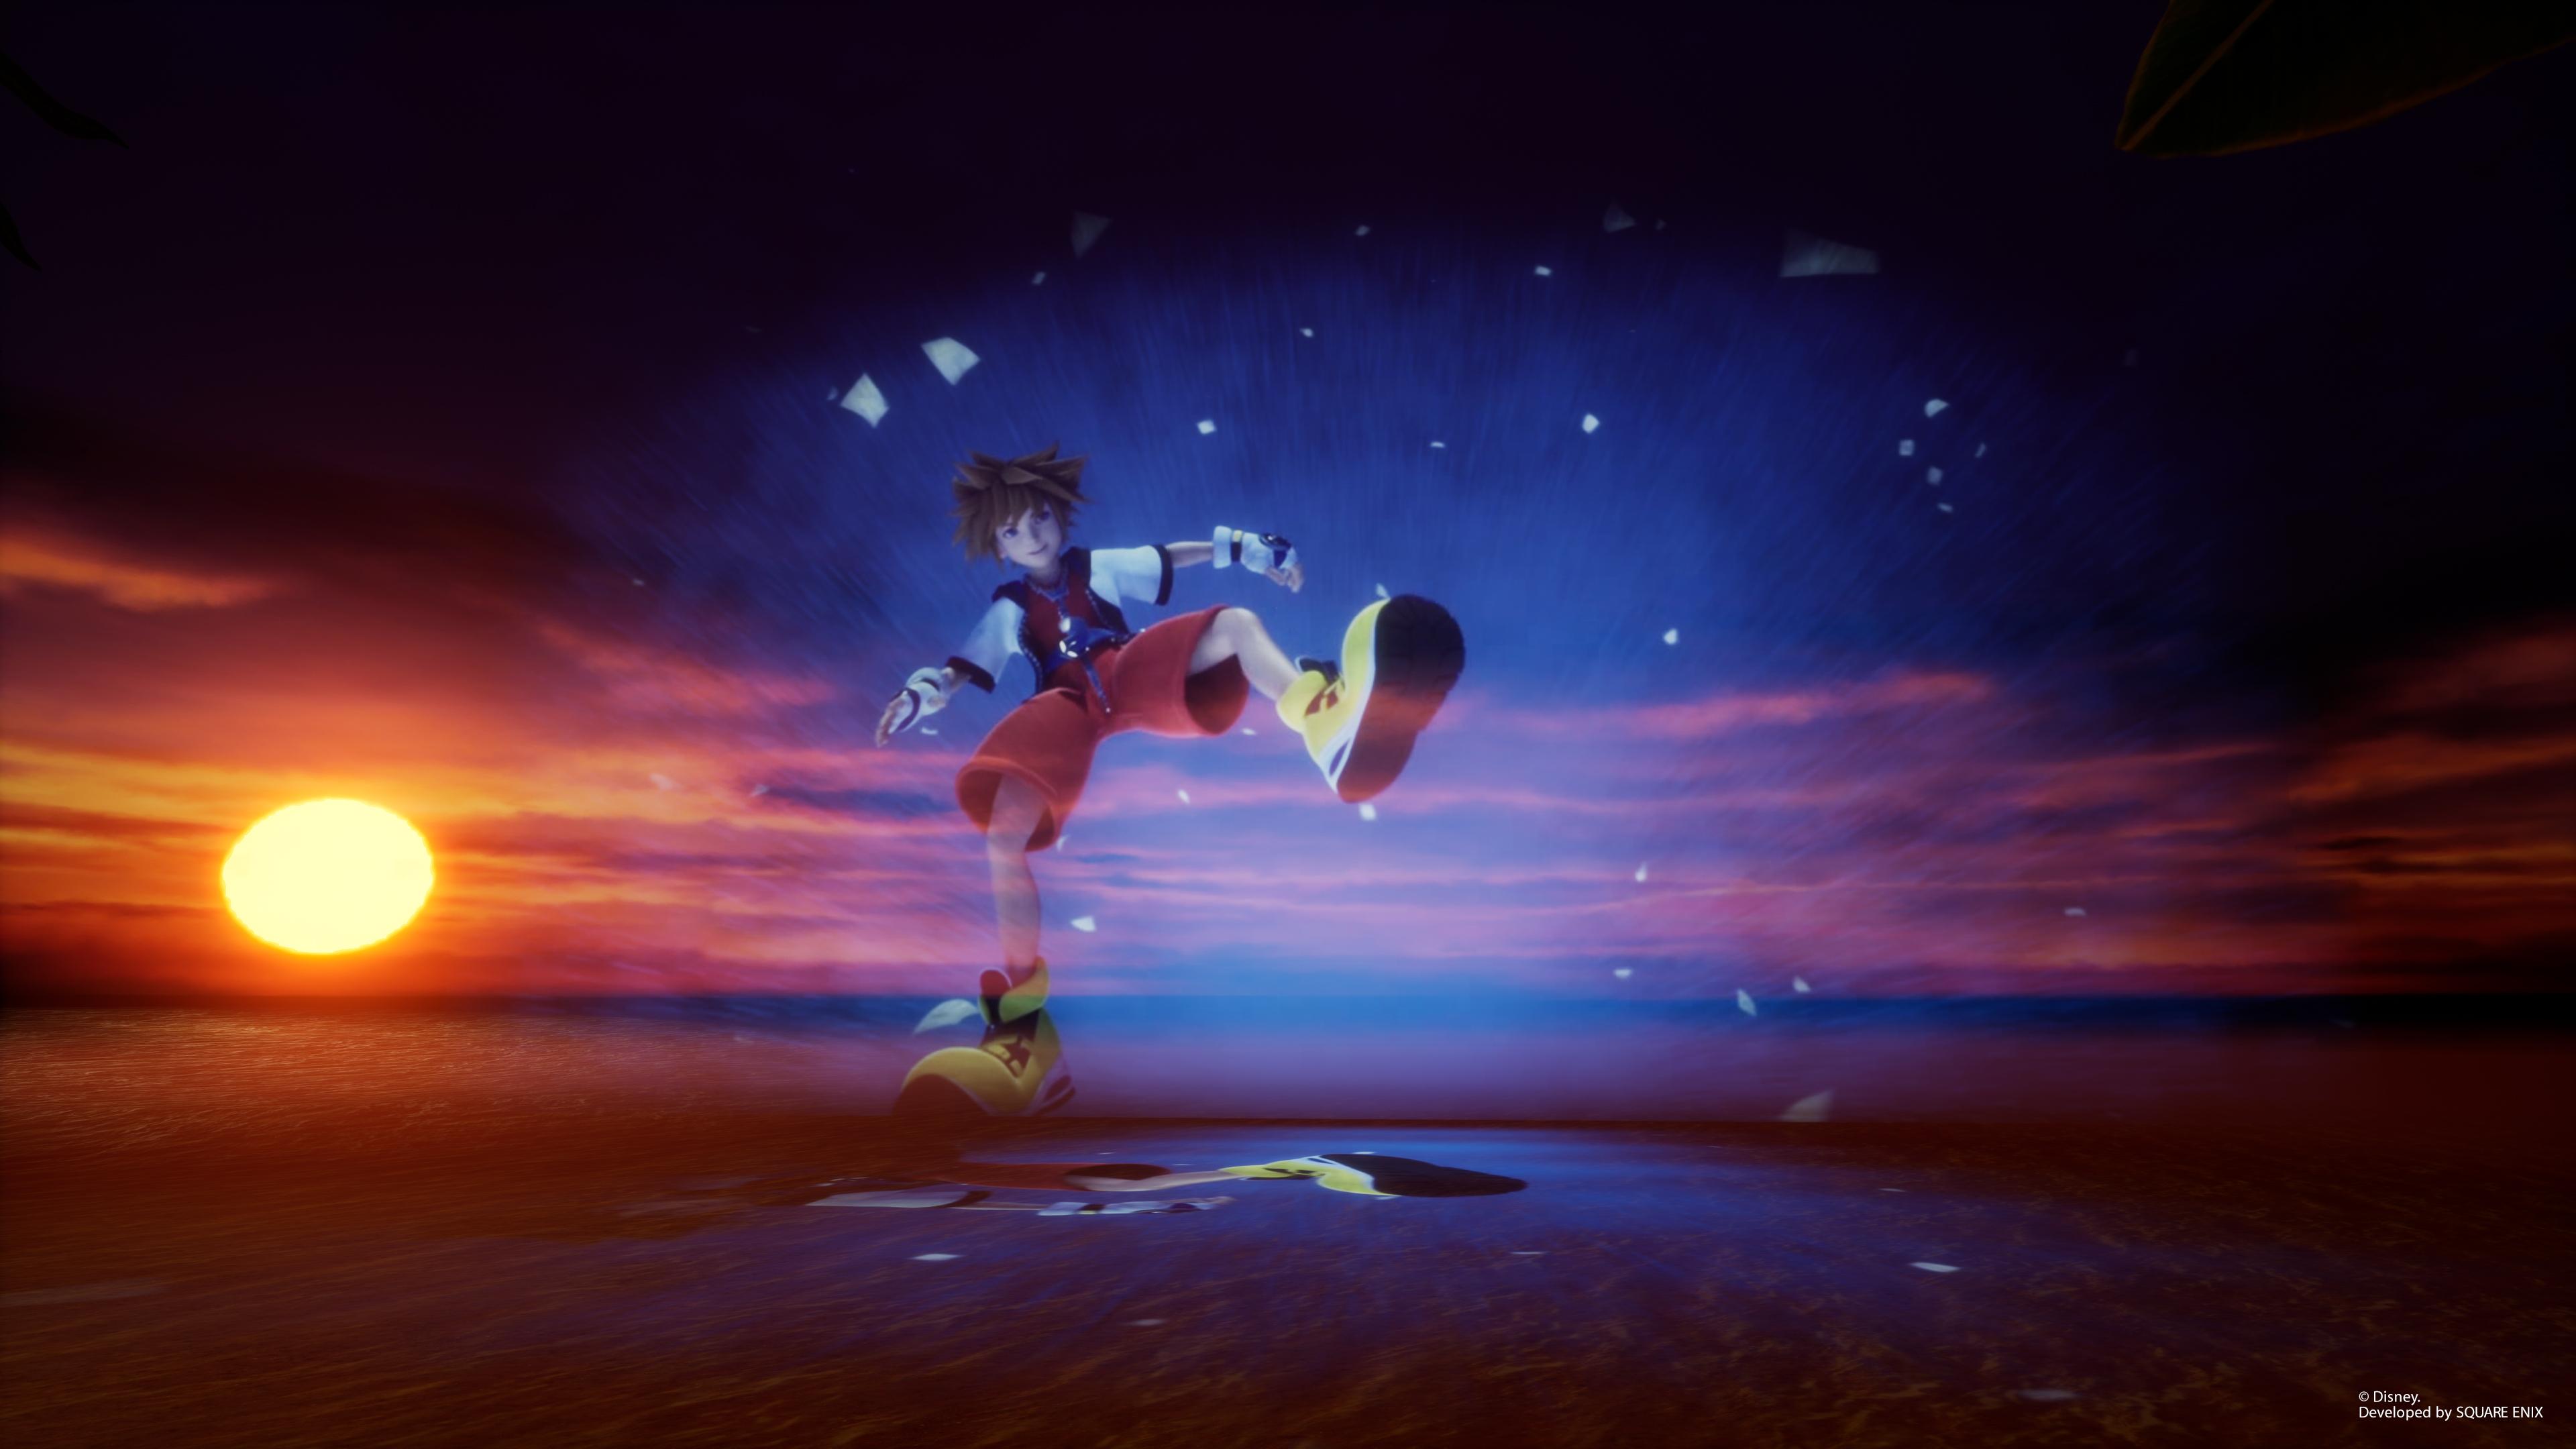 Kingdom Hearts Wallpaper Hd Games 4k Wallpapers Images